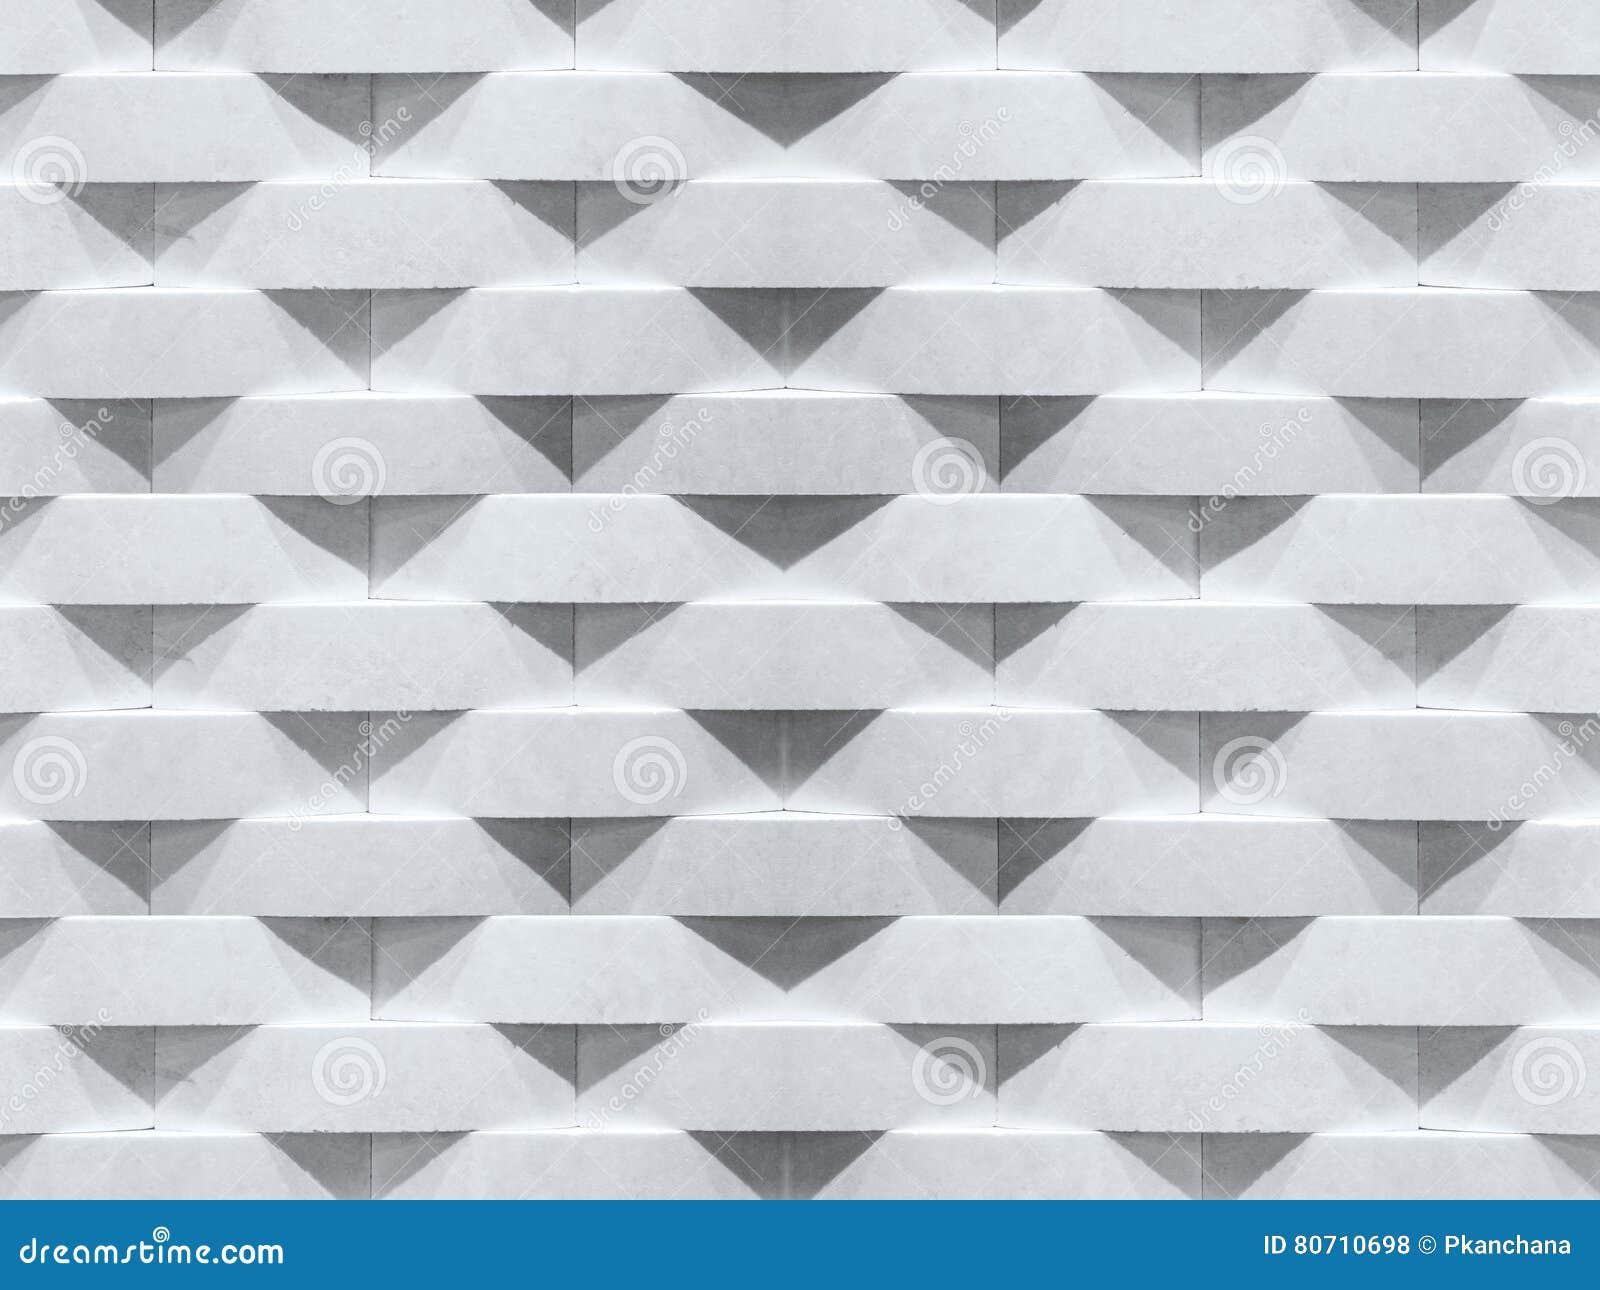 Wall background. Geometric curve stone brick pattern.